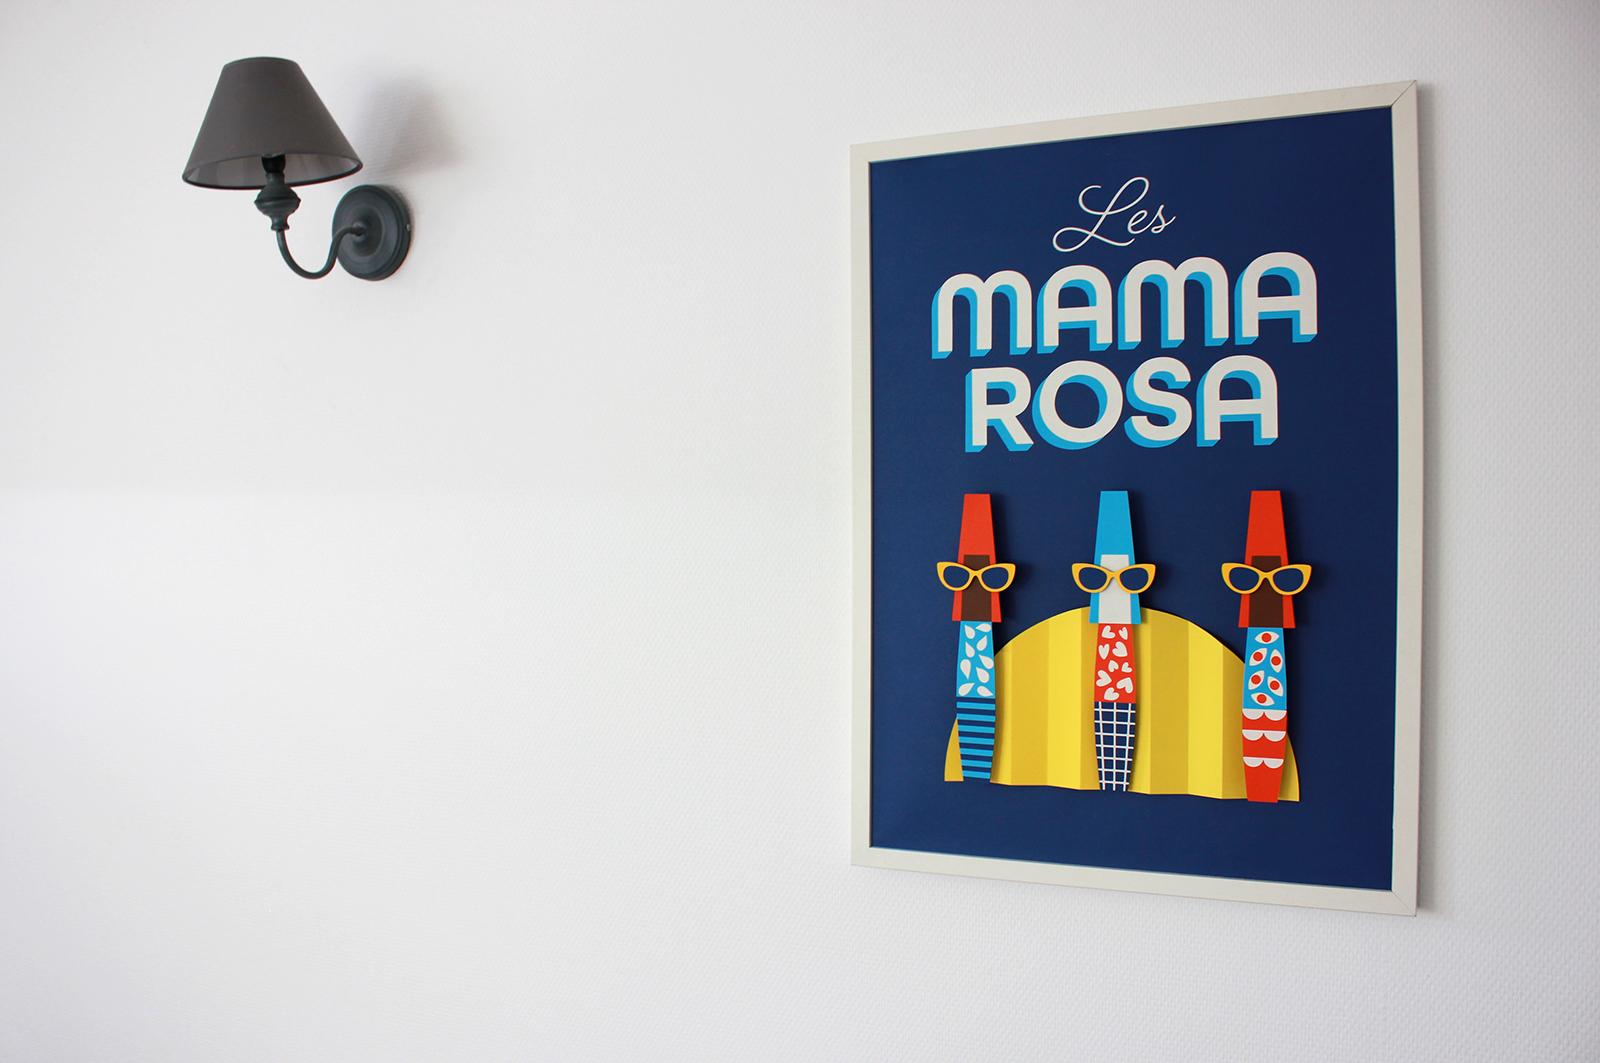 Vitrines fête des mères 2020 — Santa Rosa